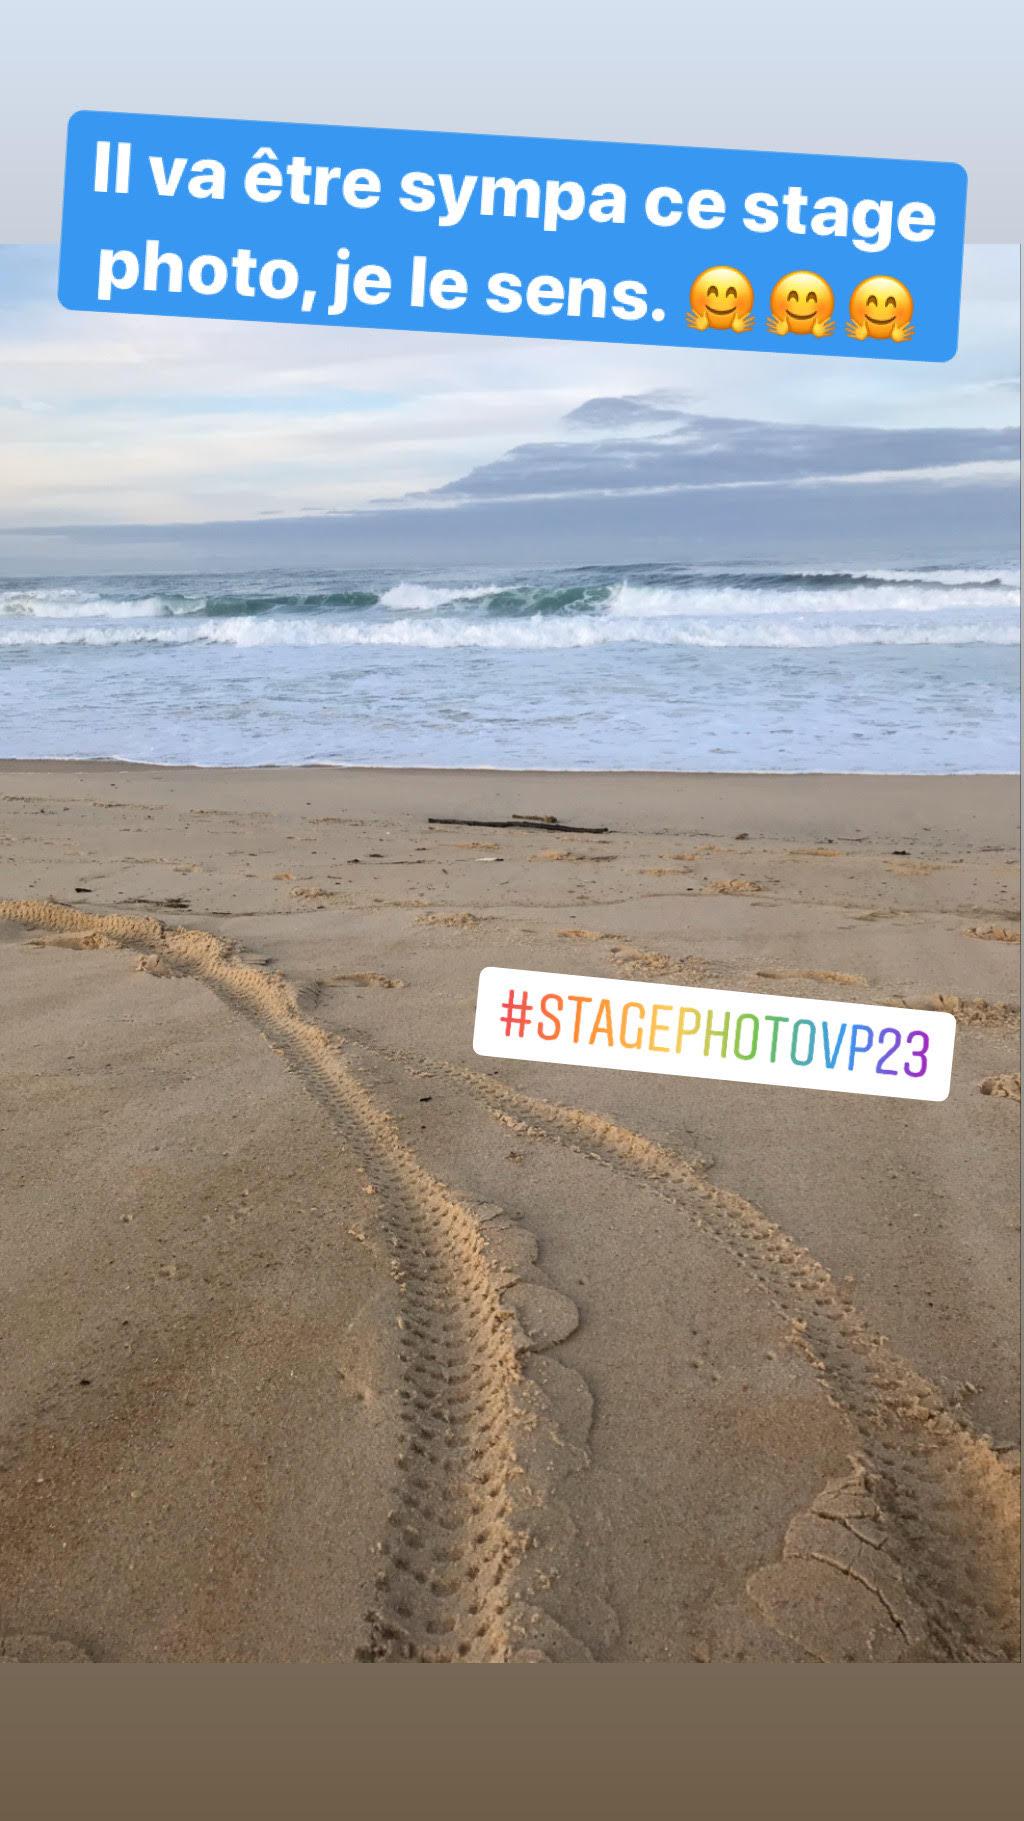 Stage photo Surf - Hossegor - VP23 - Mickaël Bonnami Photographe